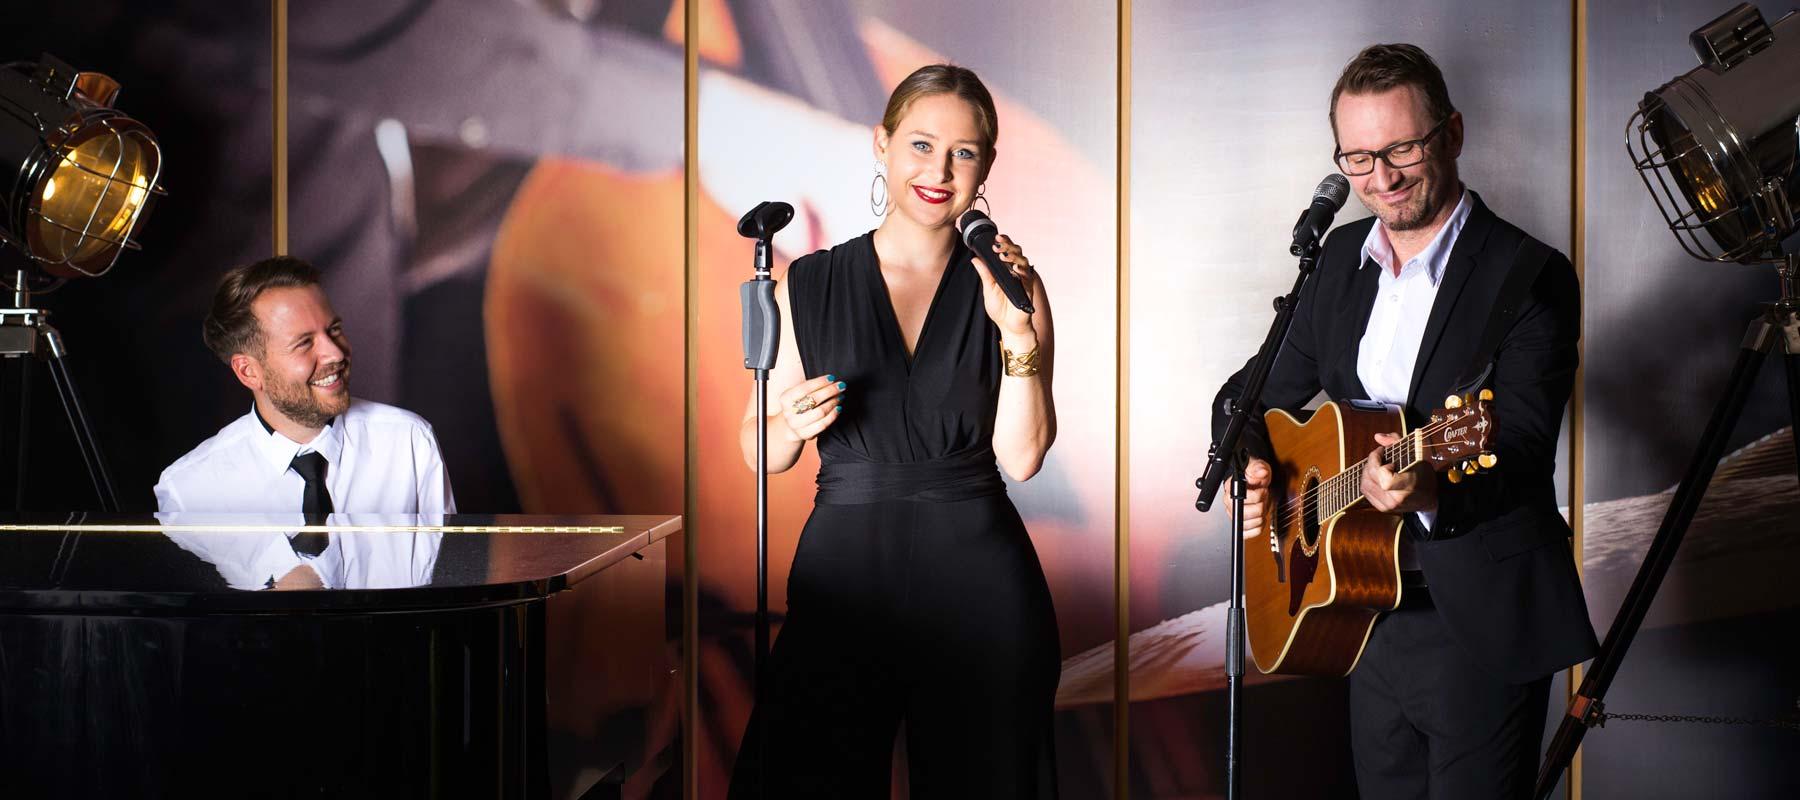 Acoustic Chocolate Hochzeitsband Tirol Musik Fur Trauung Live